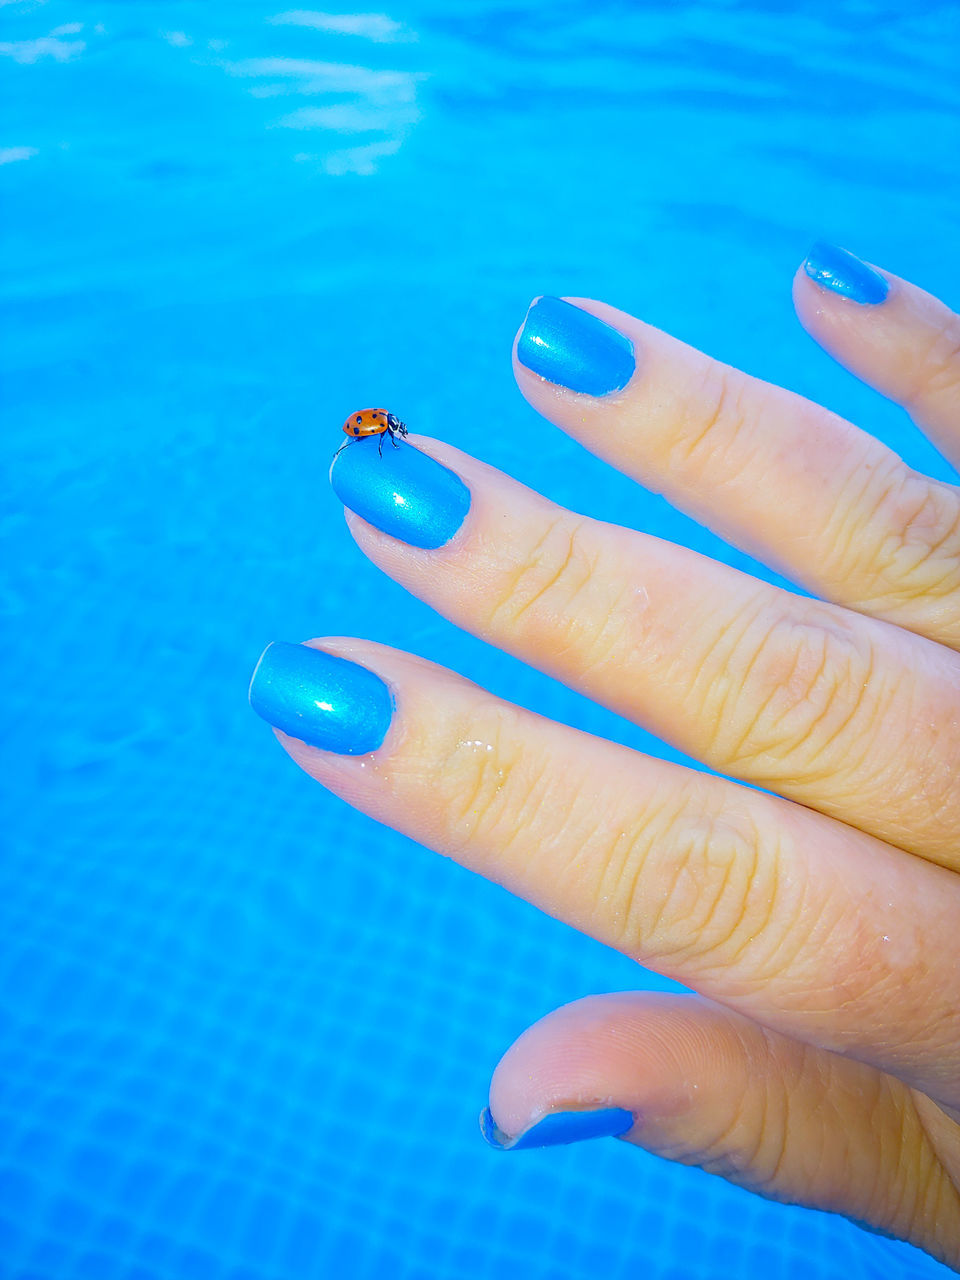 human hand, hand, human body part, finger, human finger, blue, one person, body part, real people, nail, nail polish, adult, close-up, water, women, lifestyles, day, fingernail, nail art, human limb